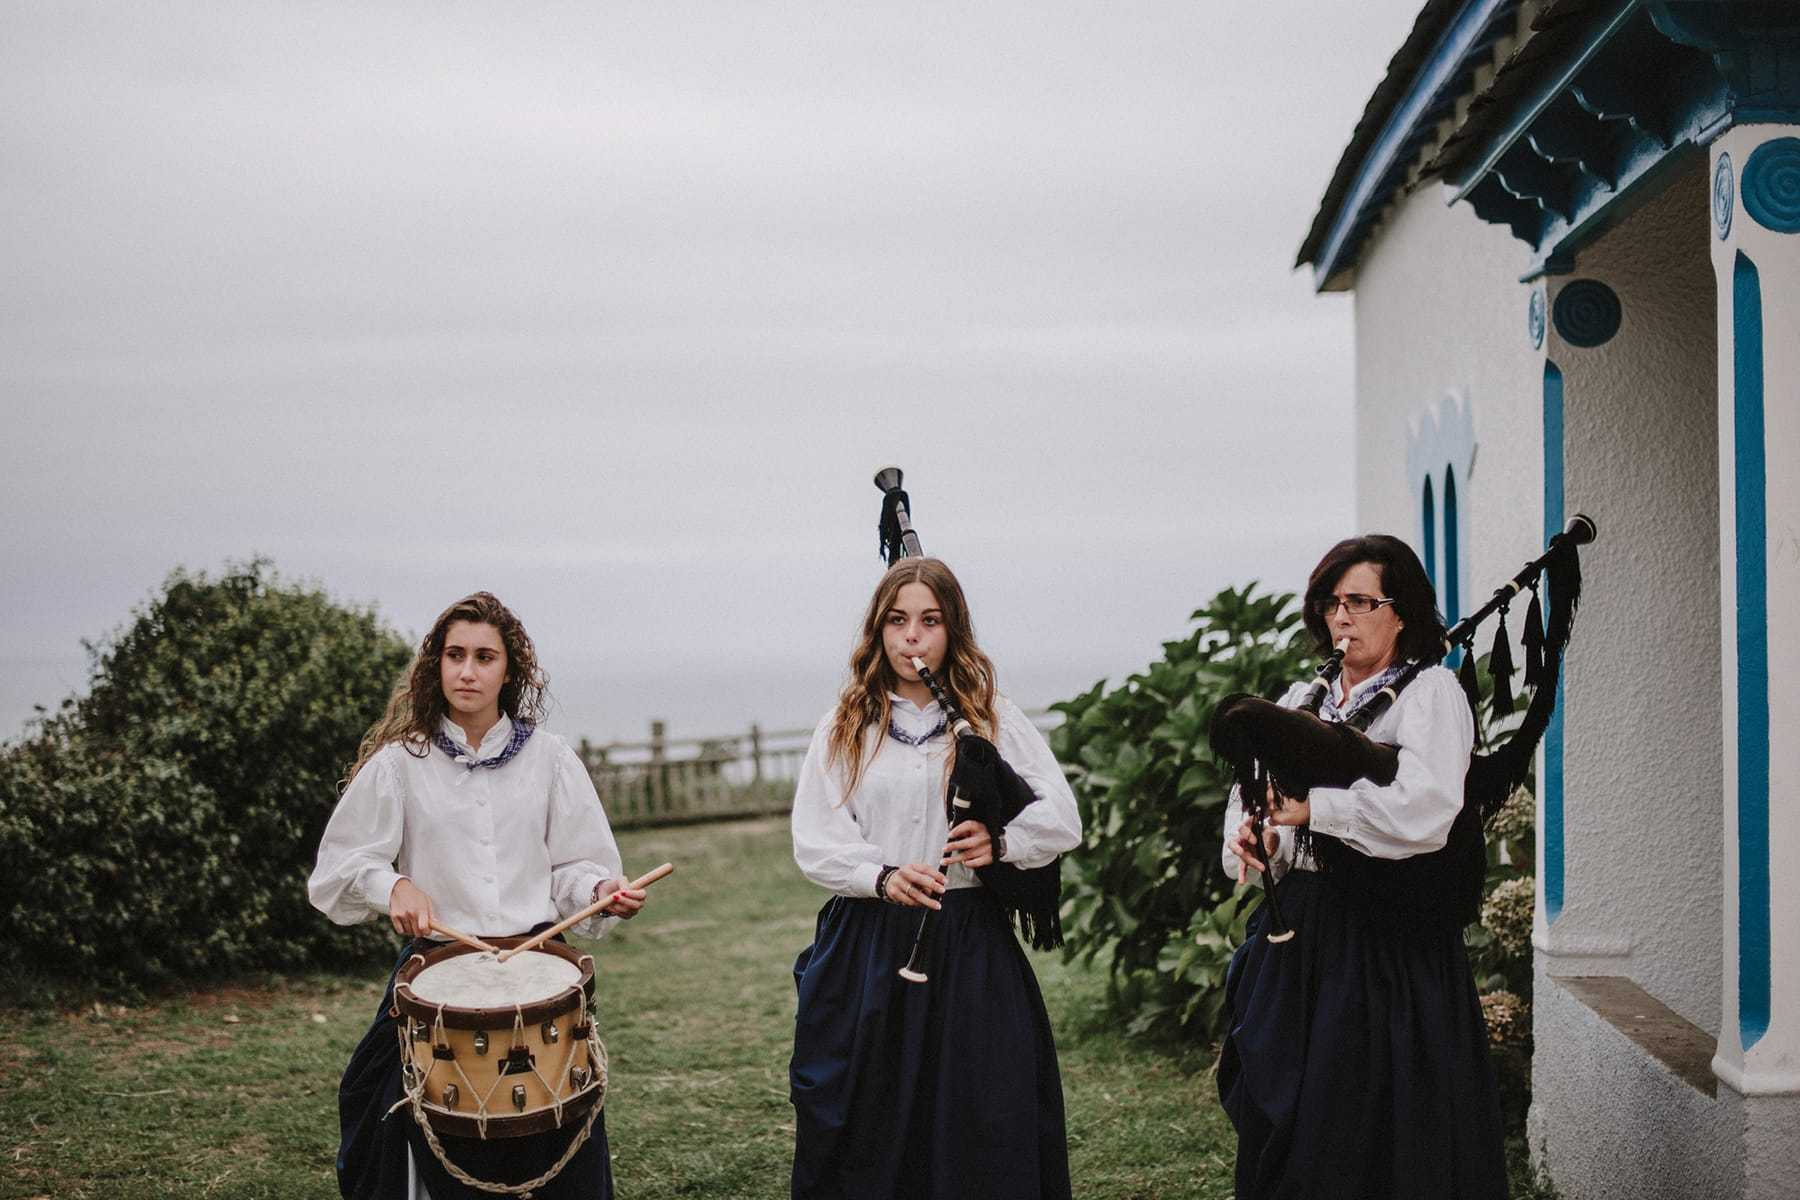 ermita_la_regalina_hilario_sanchez_fotografo_boda_asturias_019